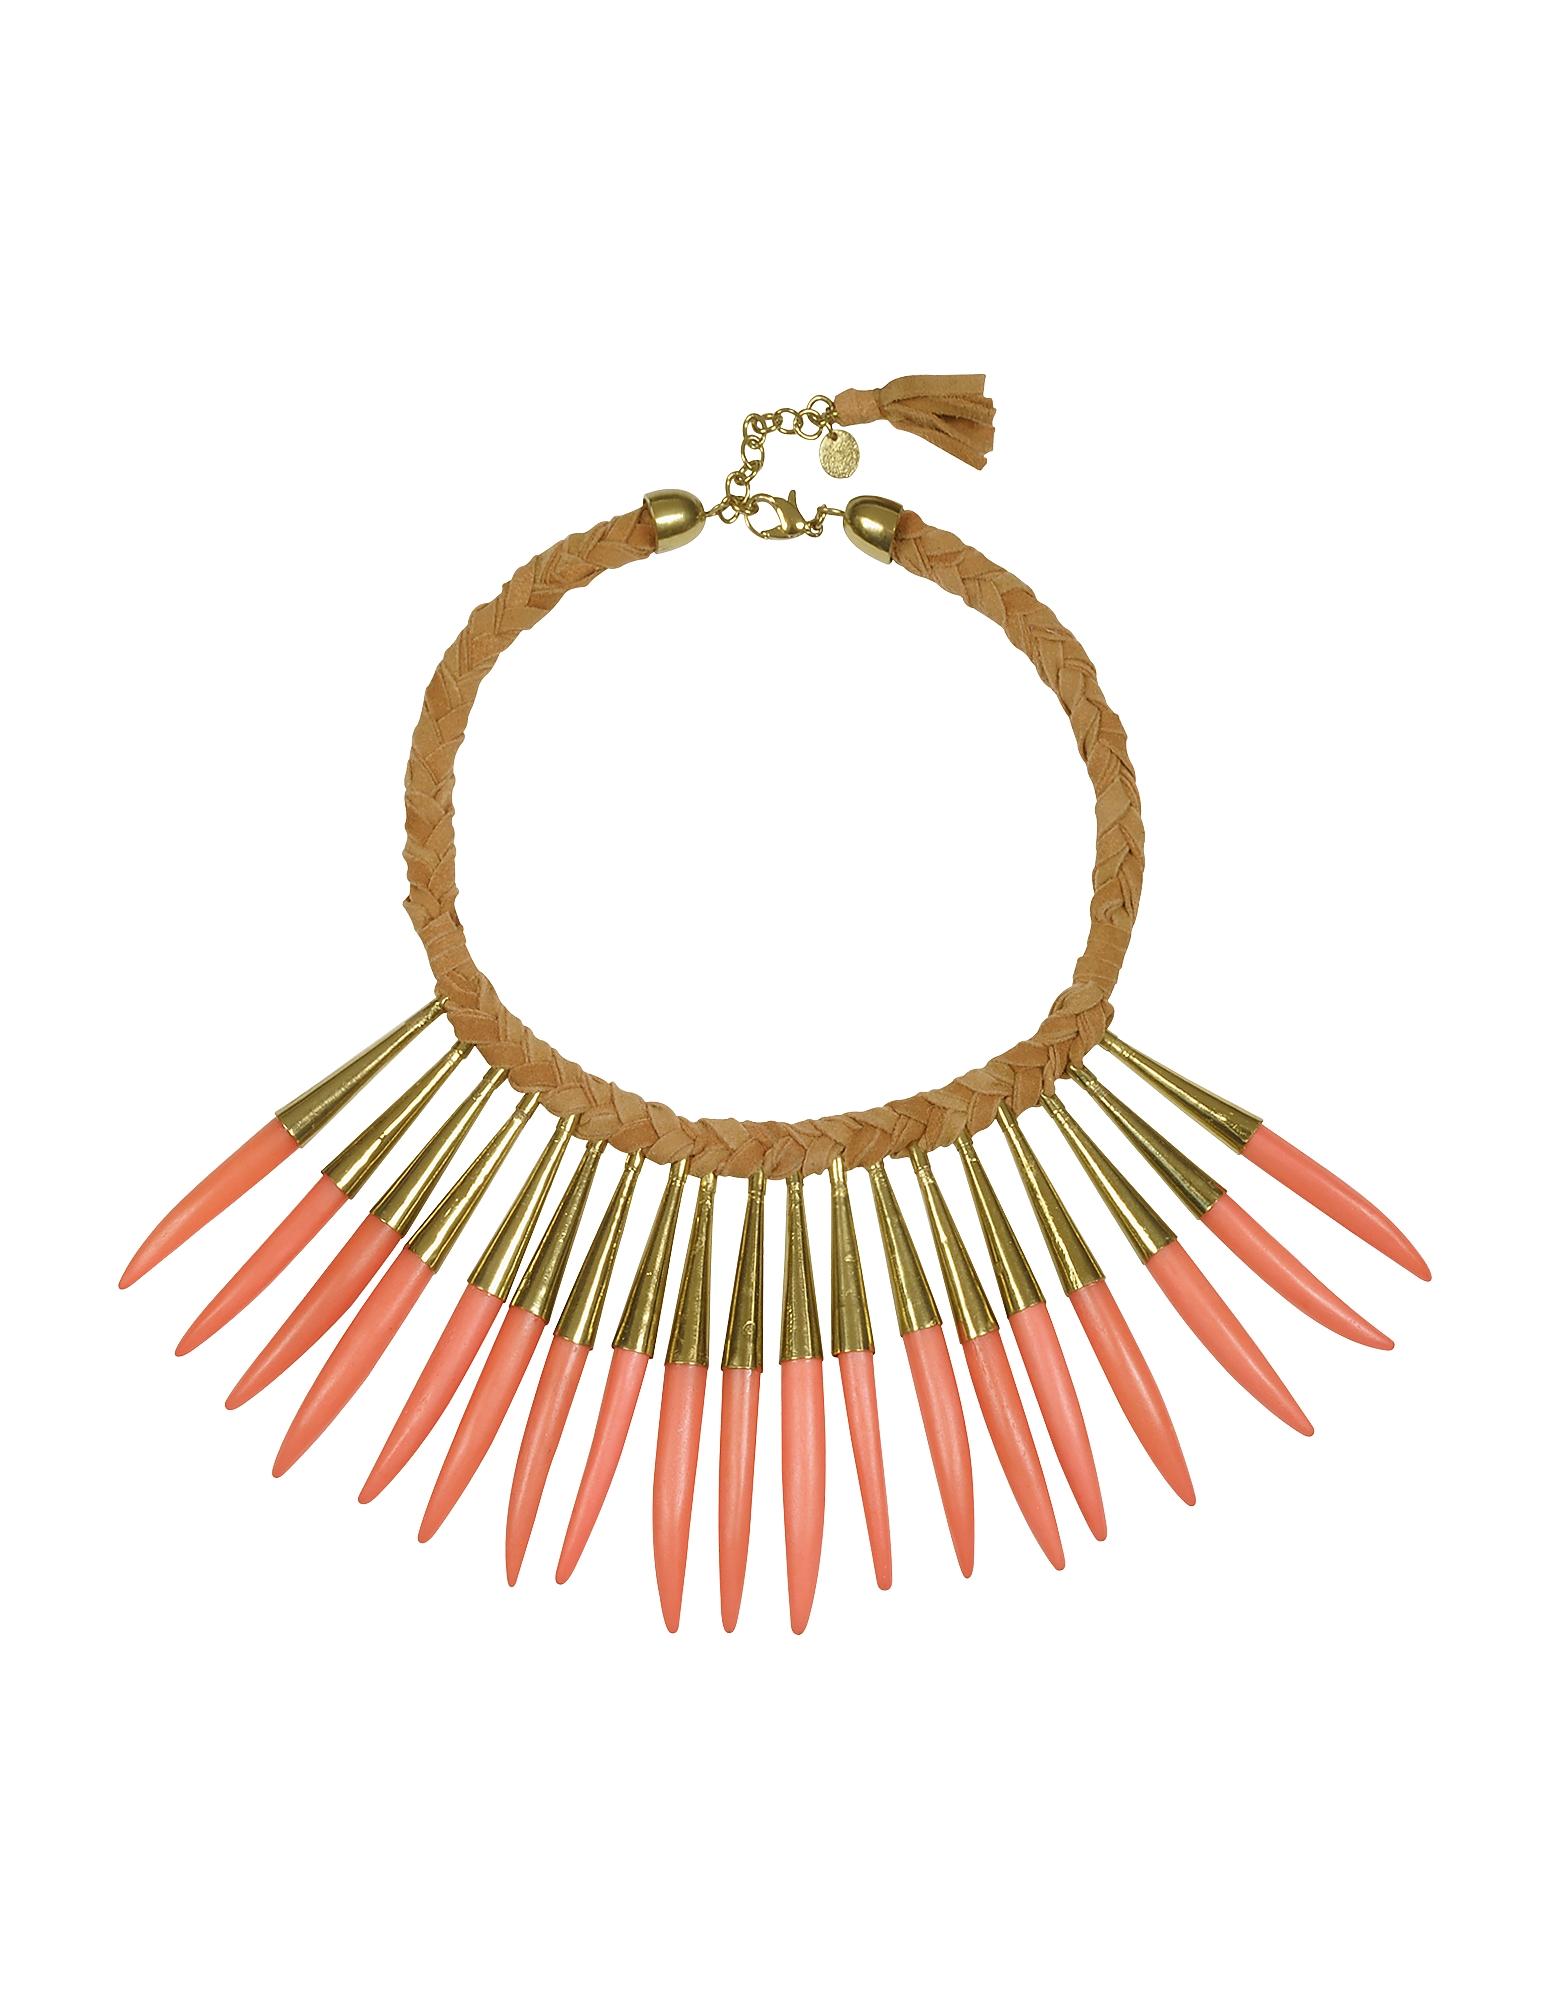 Noli - Ожерелье из Кожи и Металла